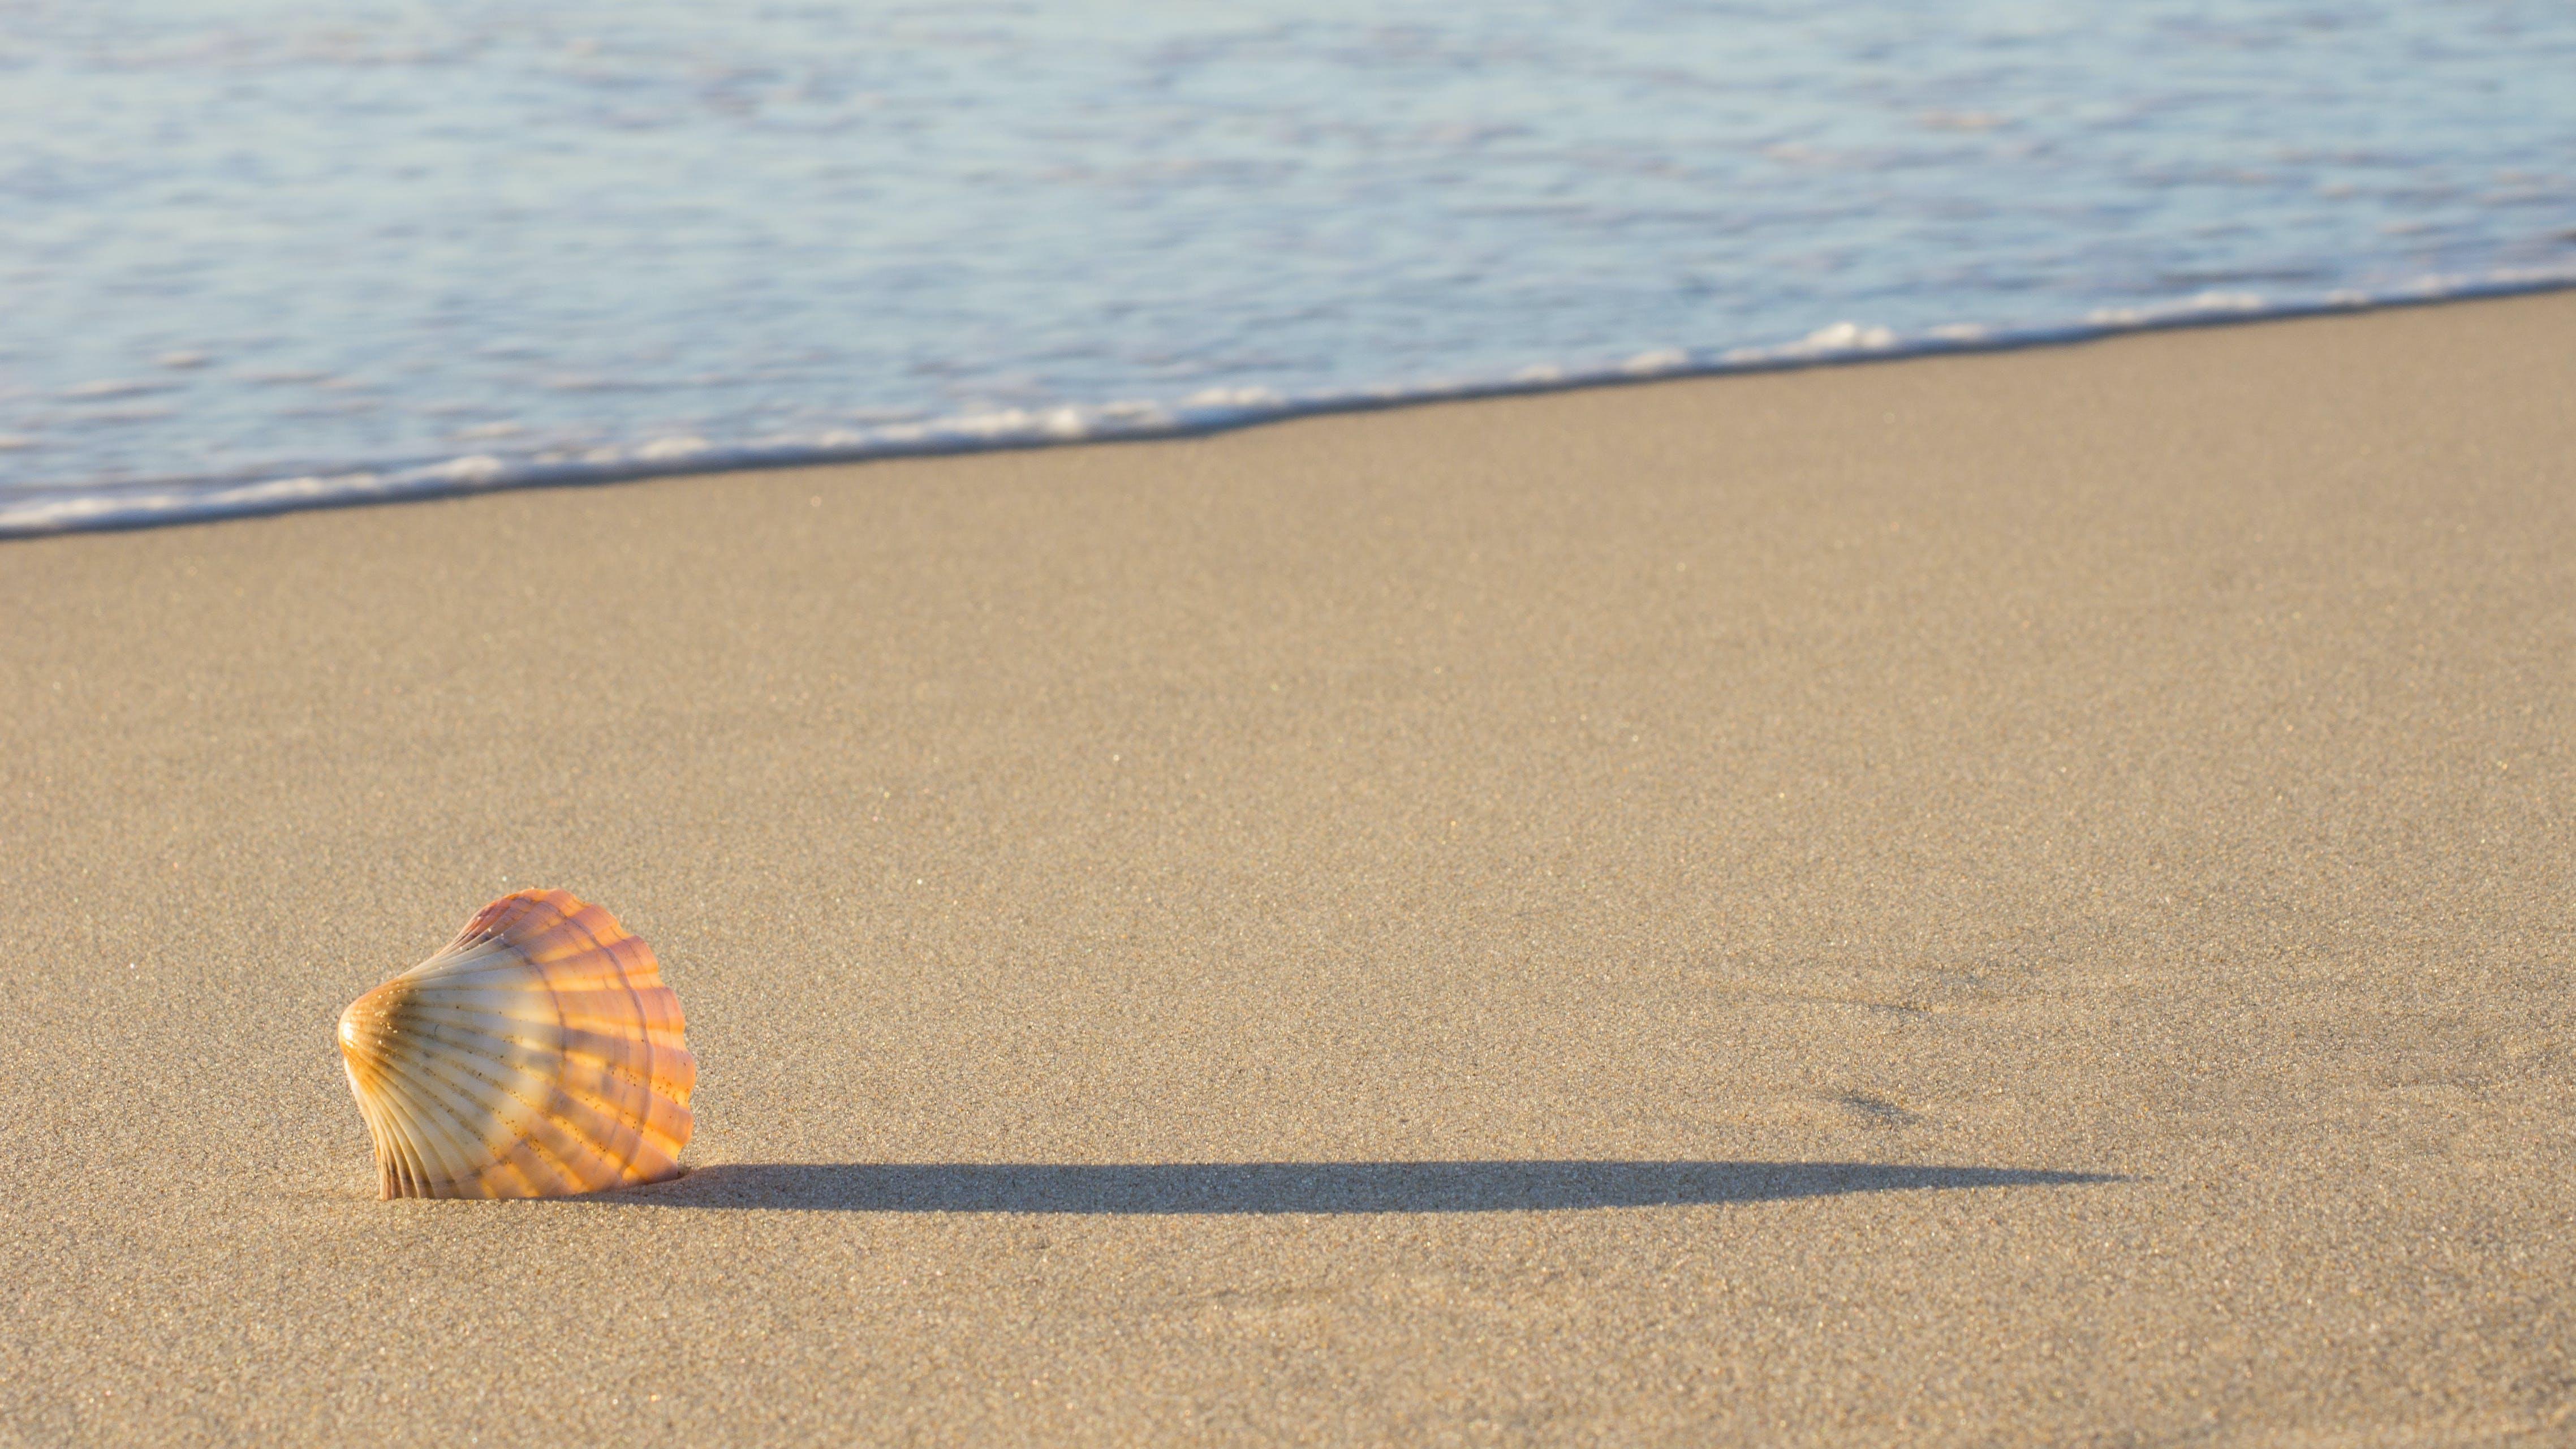 Free stock photo of beach, sand, ocean, australia